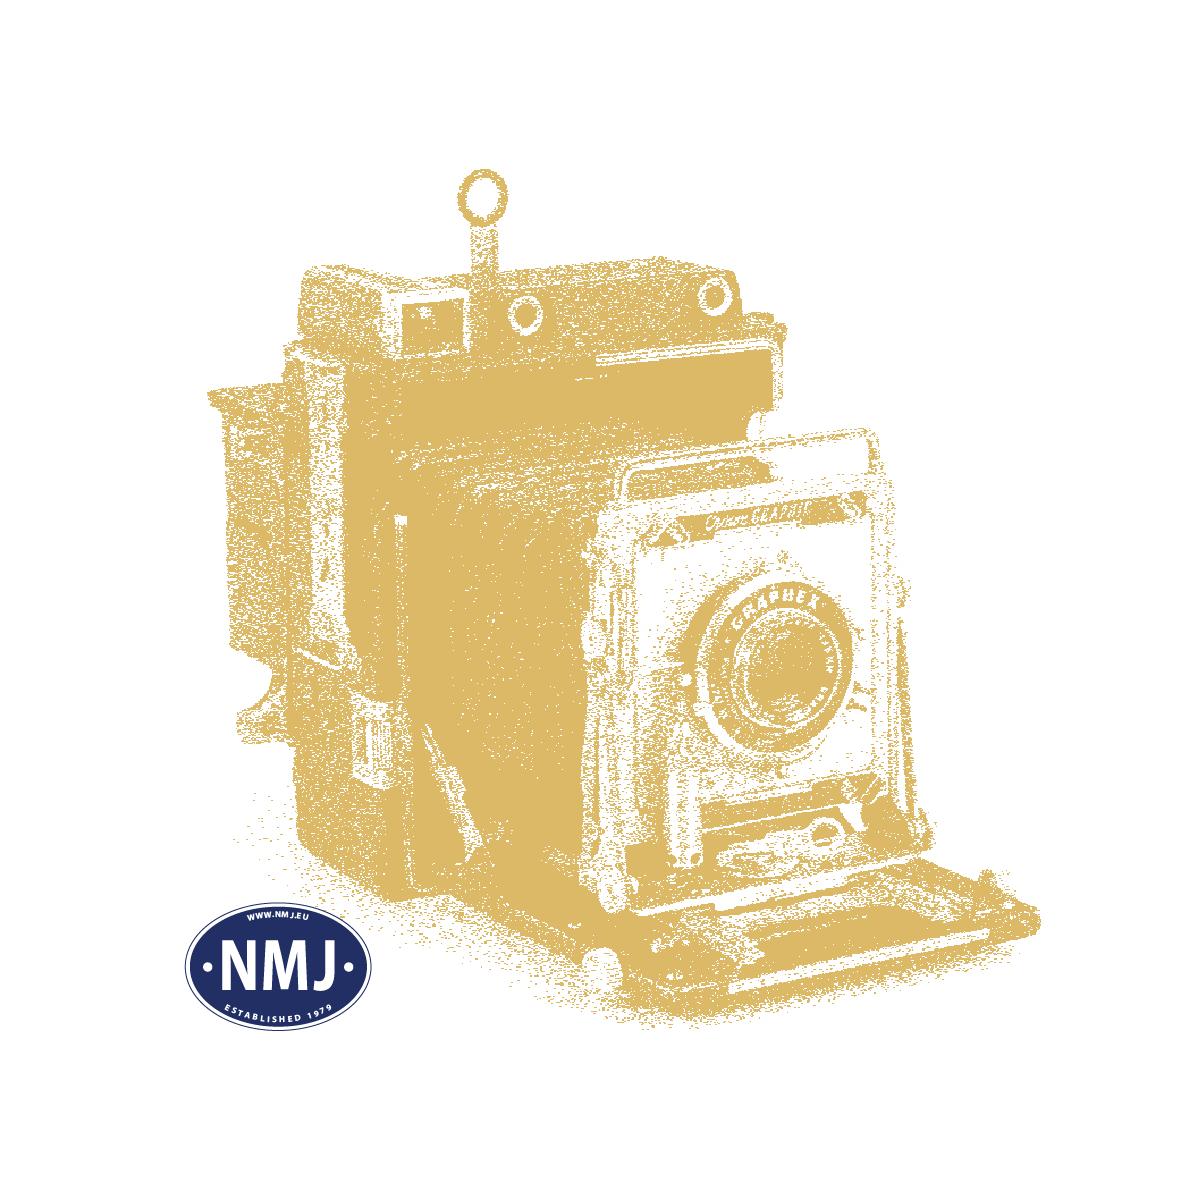 NMJT145006 - NMJ Topline NSB Di3.602 , Nydesign GM og OL-1994 Logo, DC Analog, 0-Skala